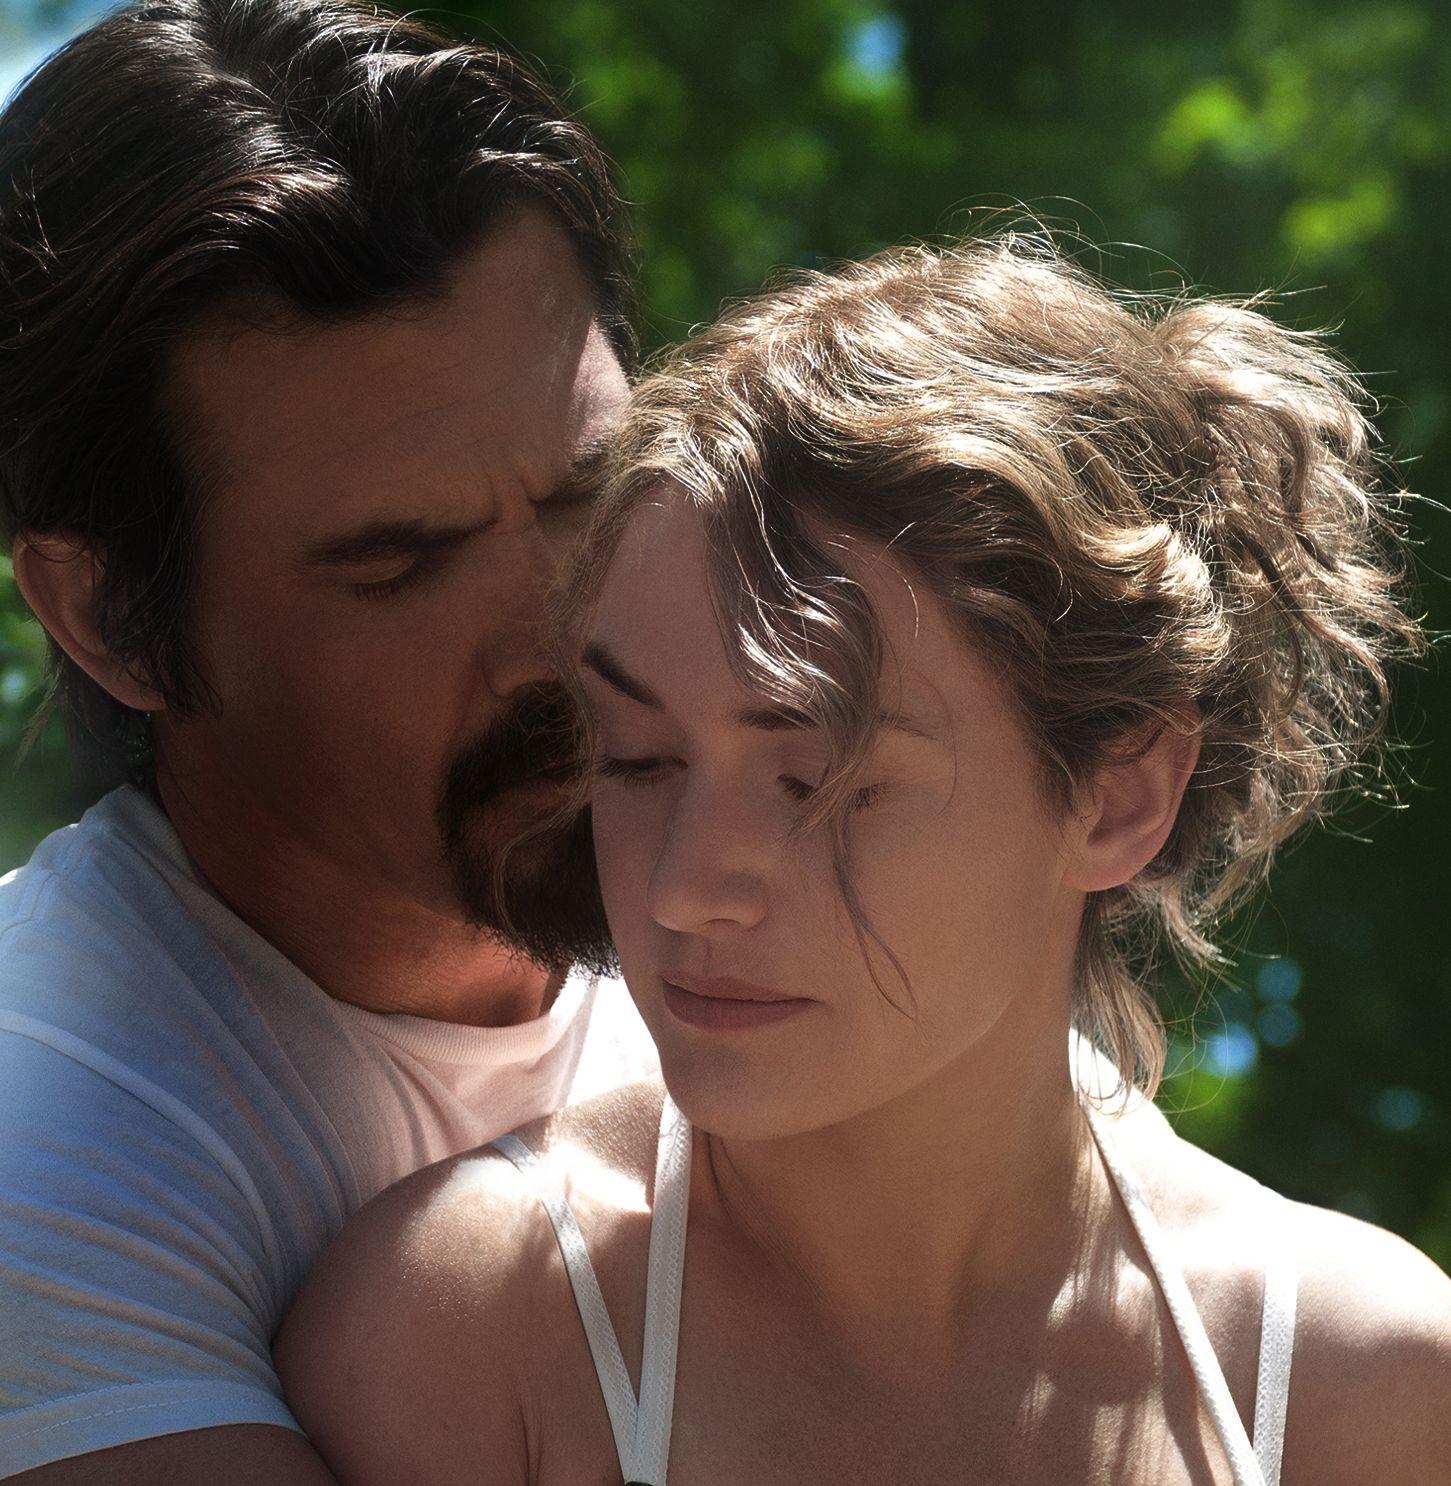 Kate Winslet and Josh Brolin in Jason Reitman's new film Lab